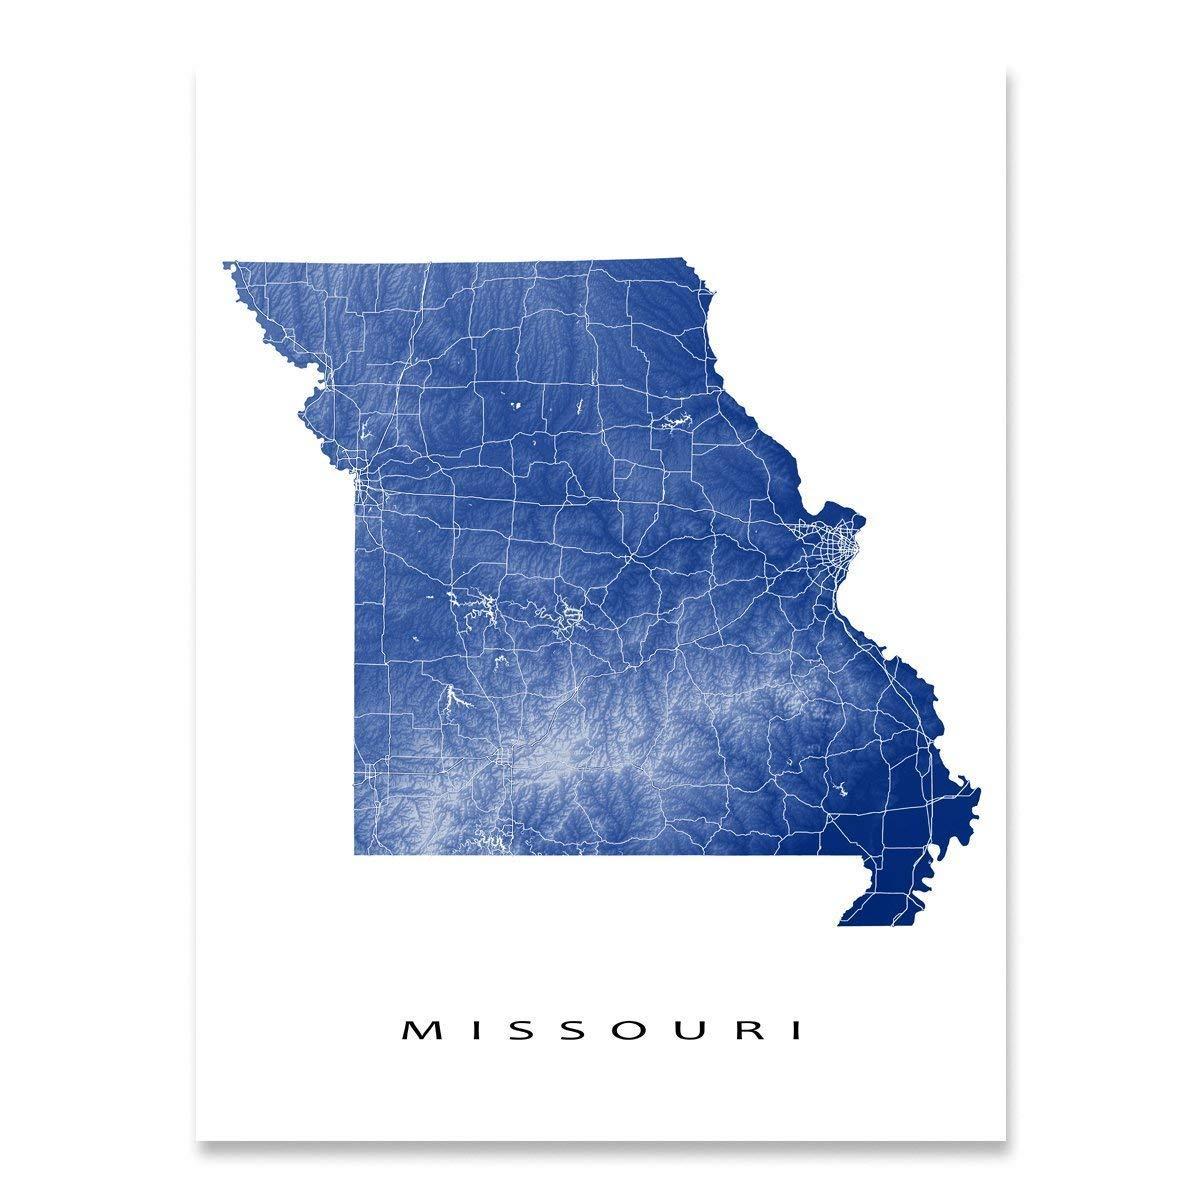 Amazon.com: Missouri Map Art Print, MO State Outline, USA ...